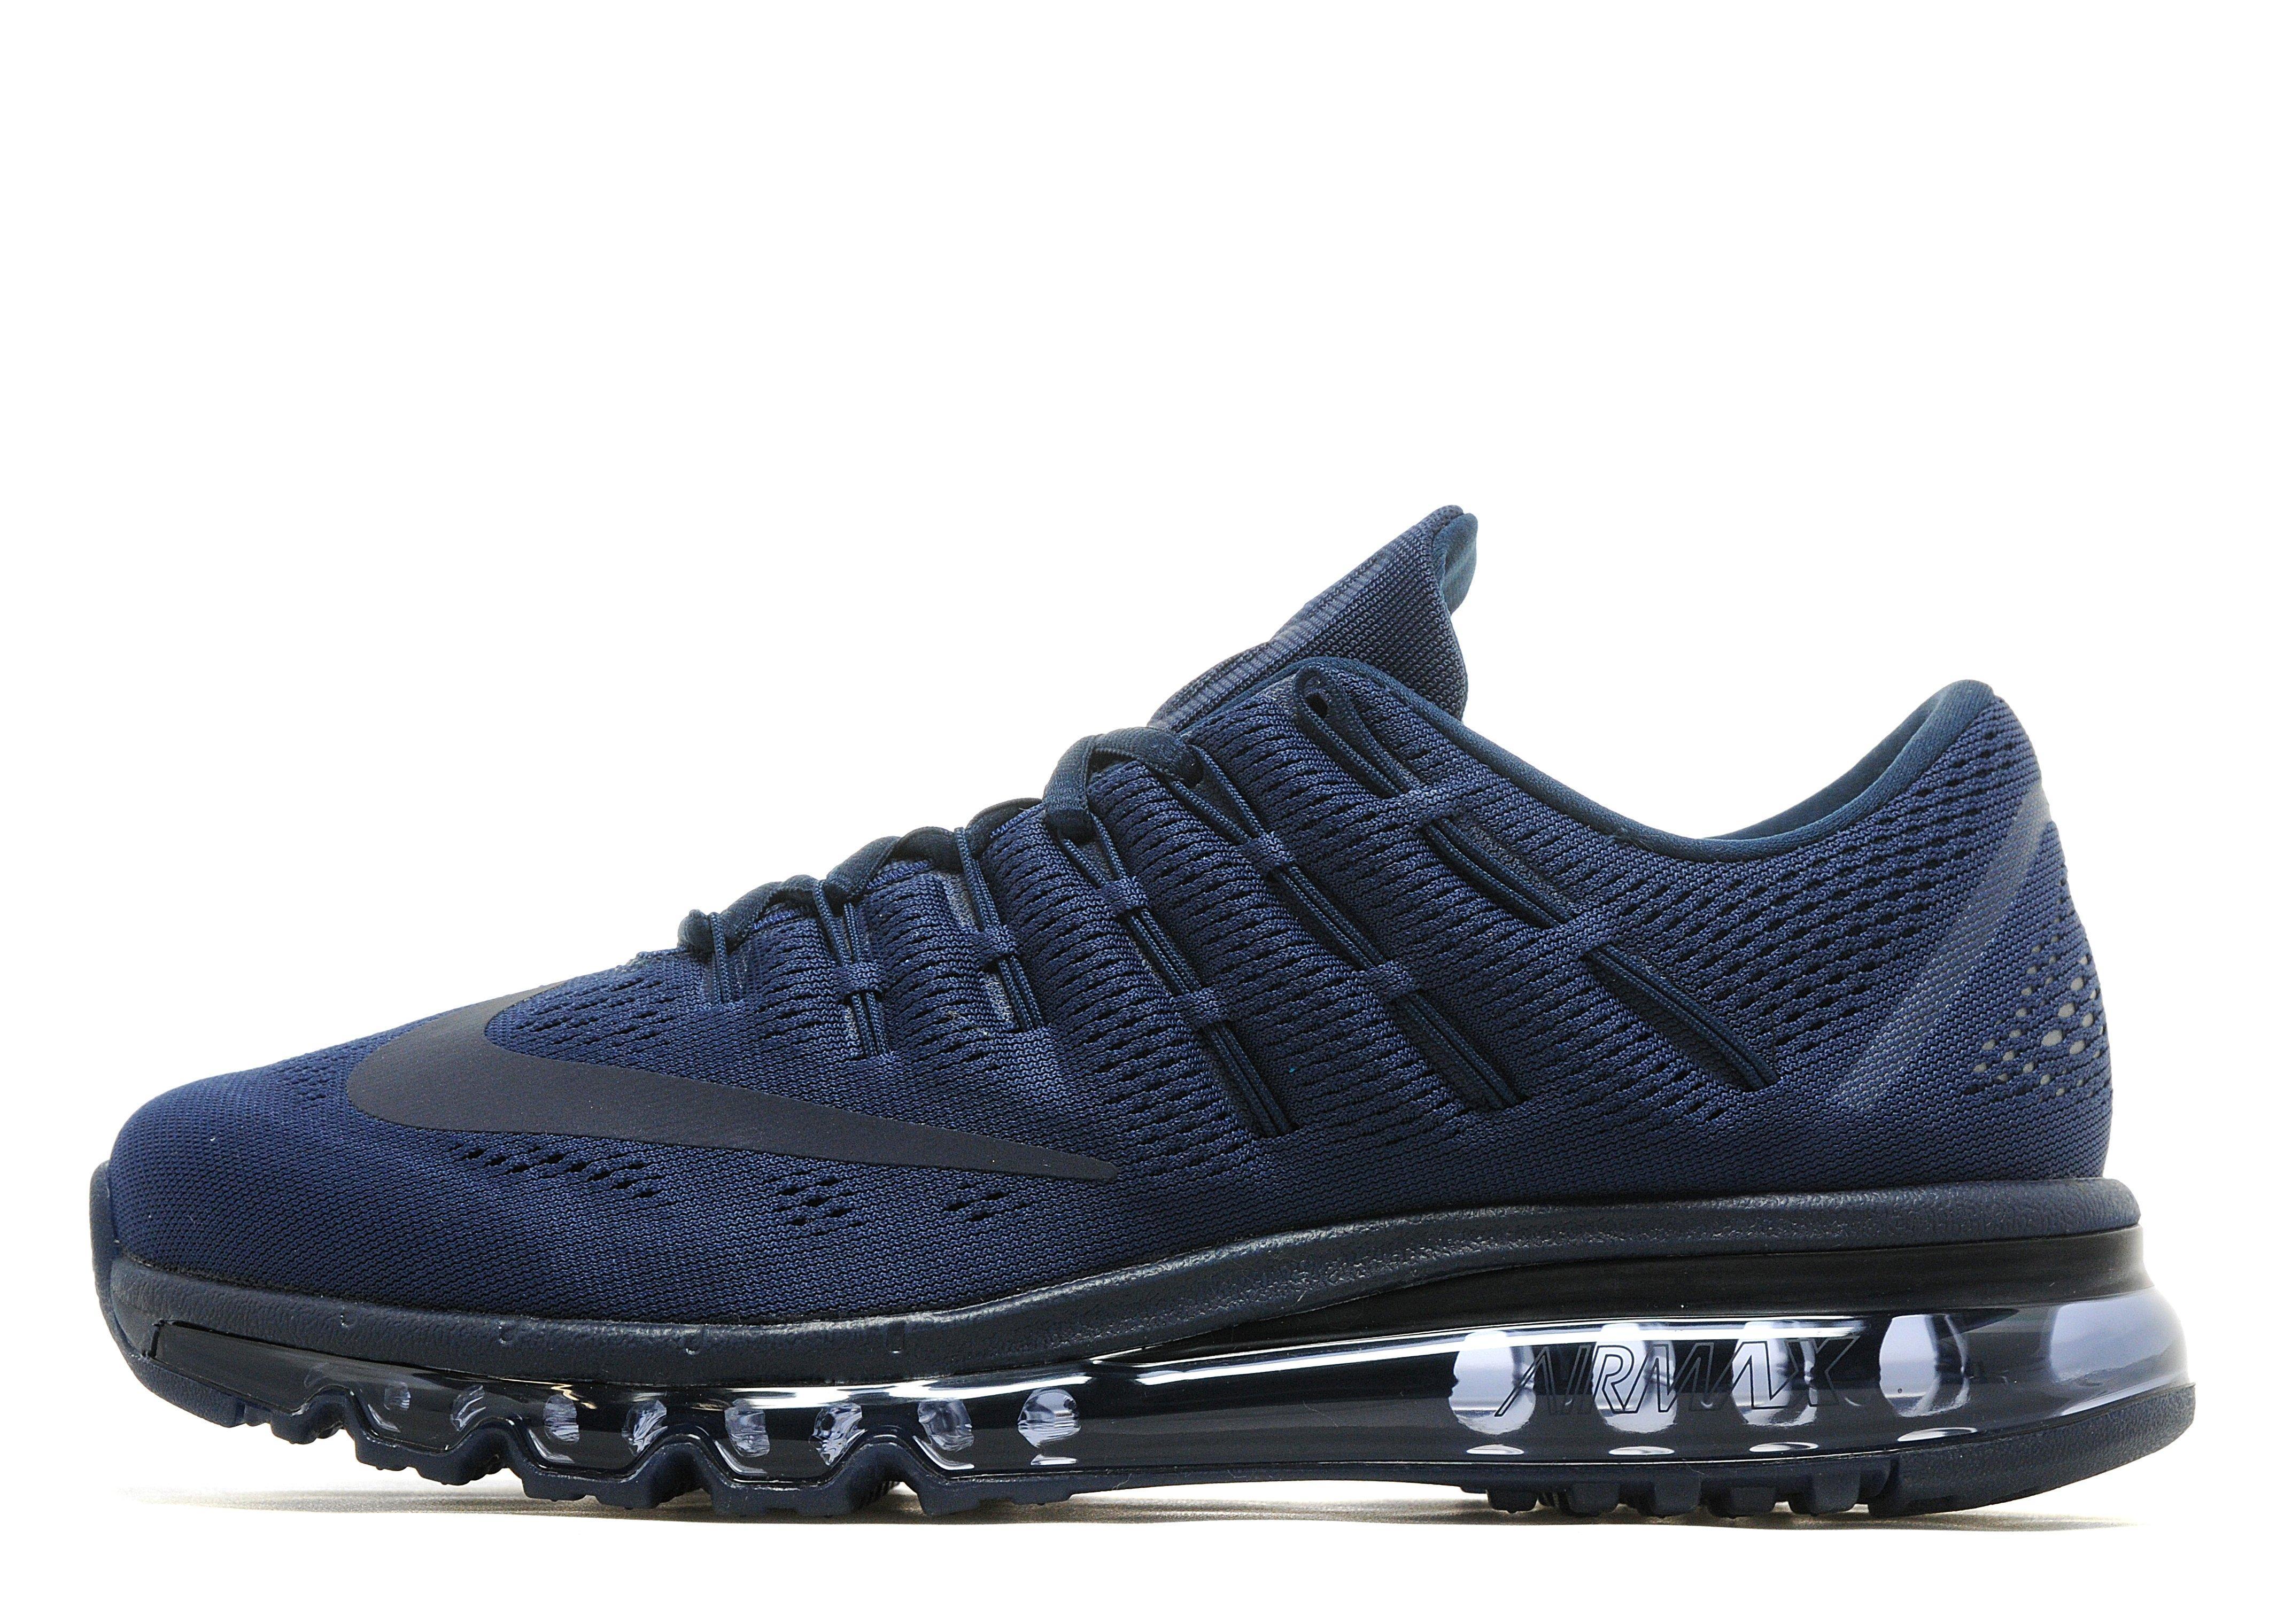 new product df92d 2ca80 ... navy blue pink best 8377f 52757  promo code for switzerland muchachos nike  air max 2016 2928b df6fb c37de 0c27c